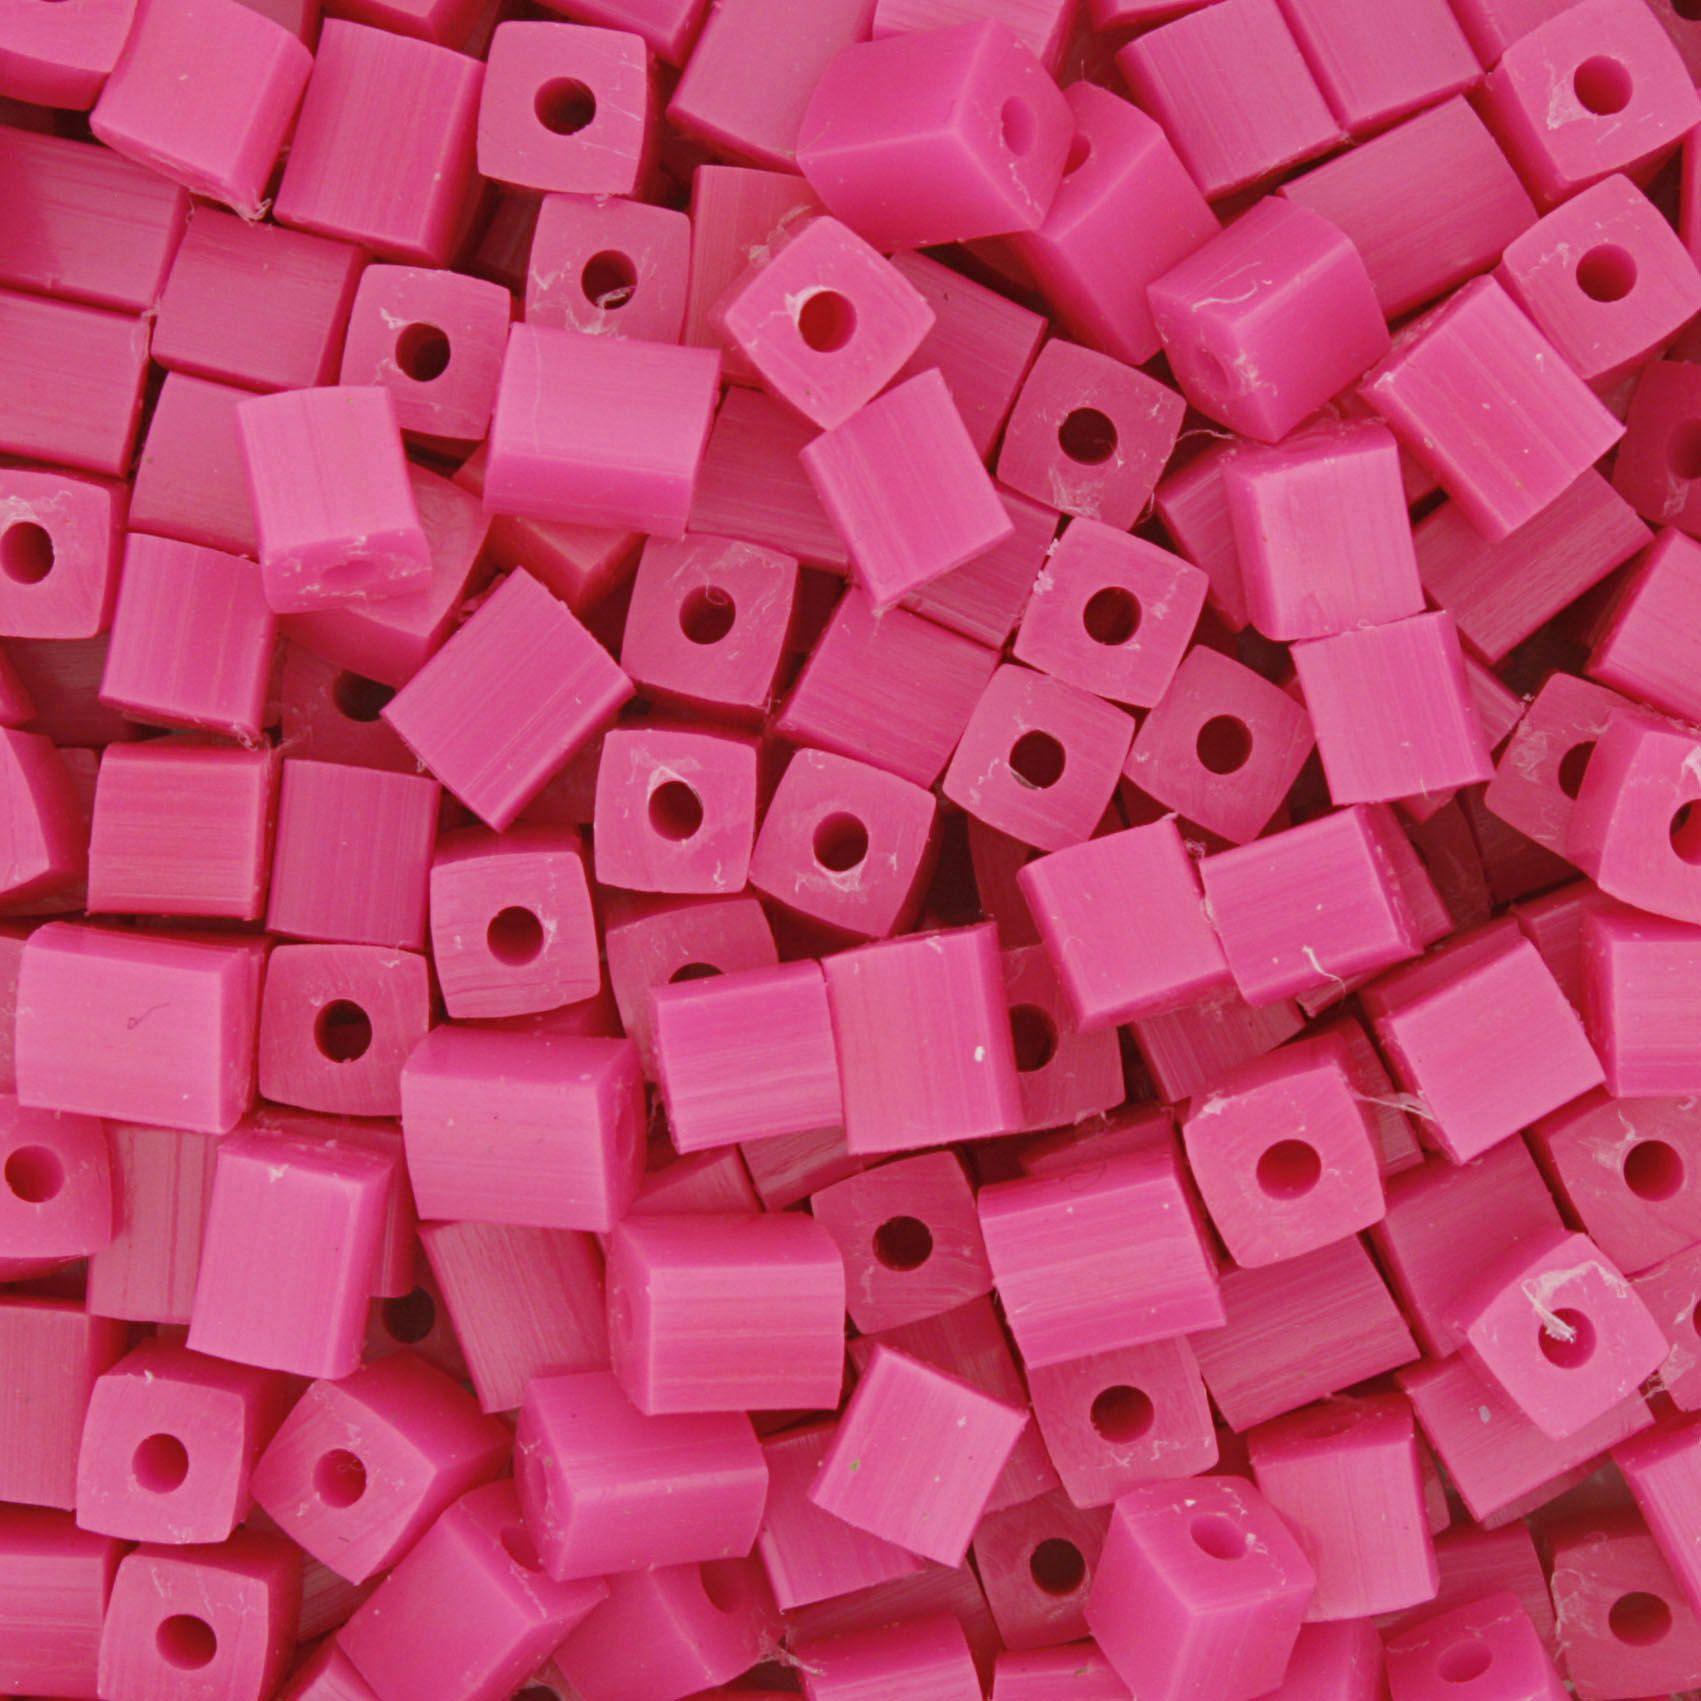 Quadradinho - Pink Neon - 5mm  - Stéphanie Bijoux® - Peças para Bijuterias e Artesanato